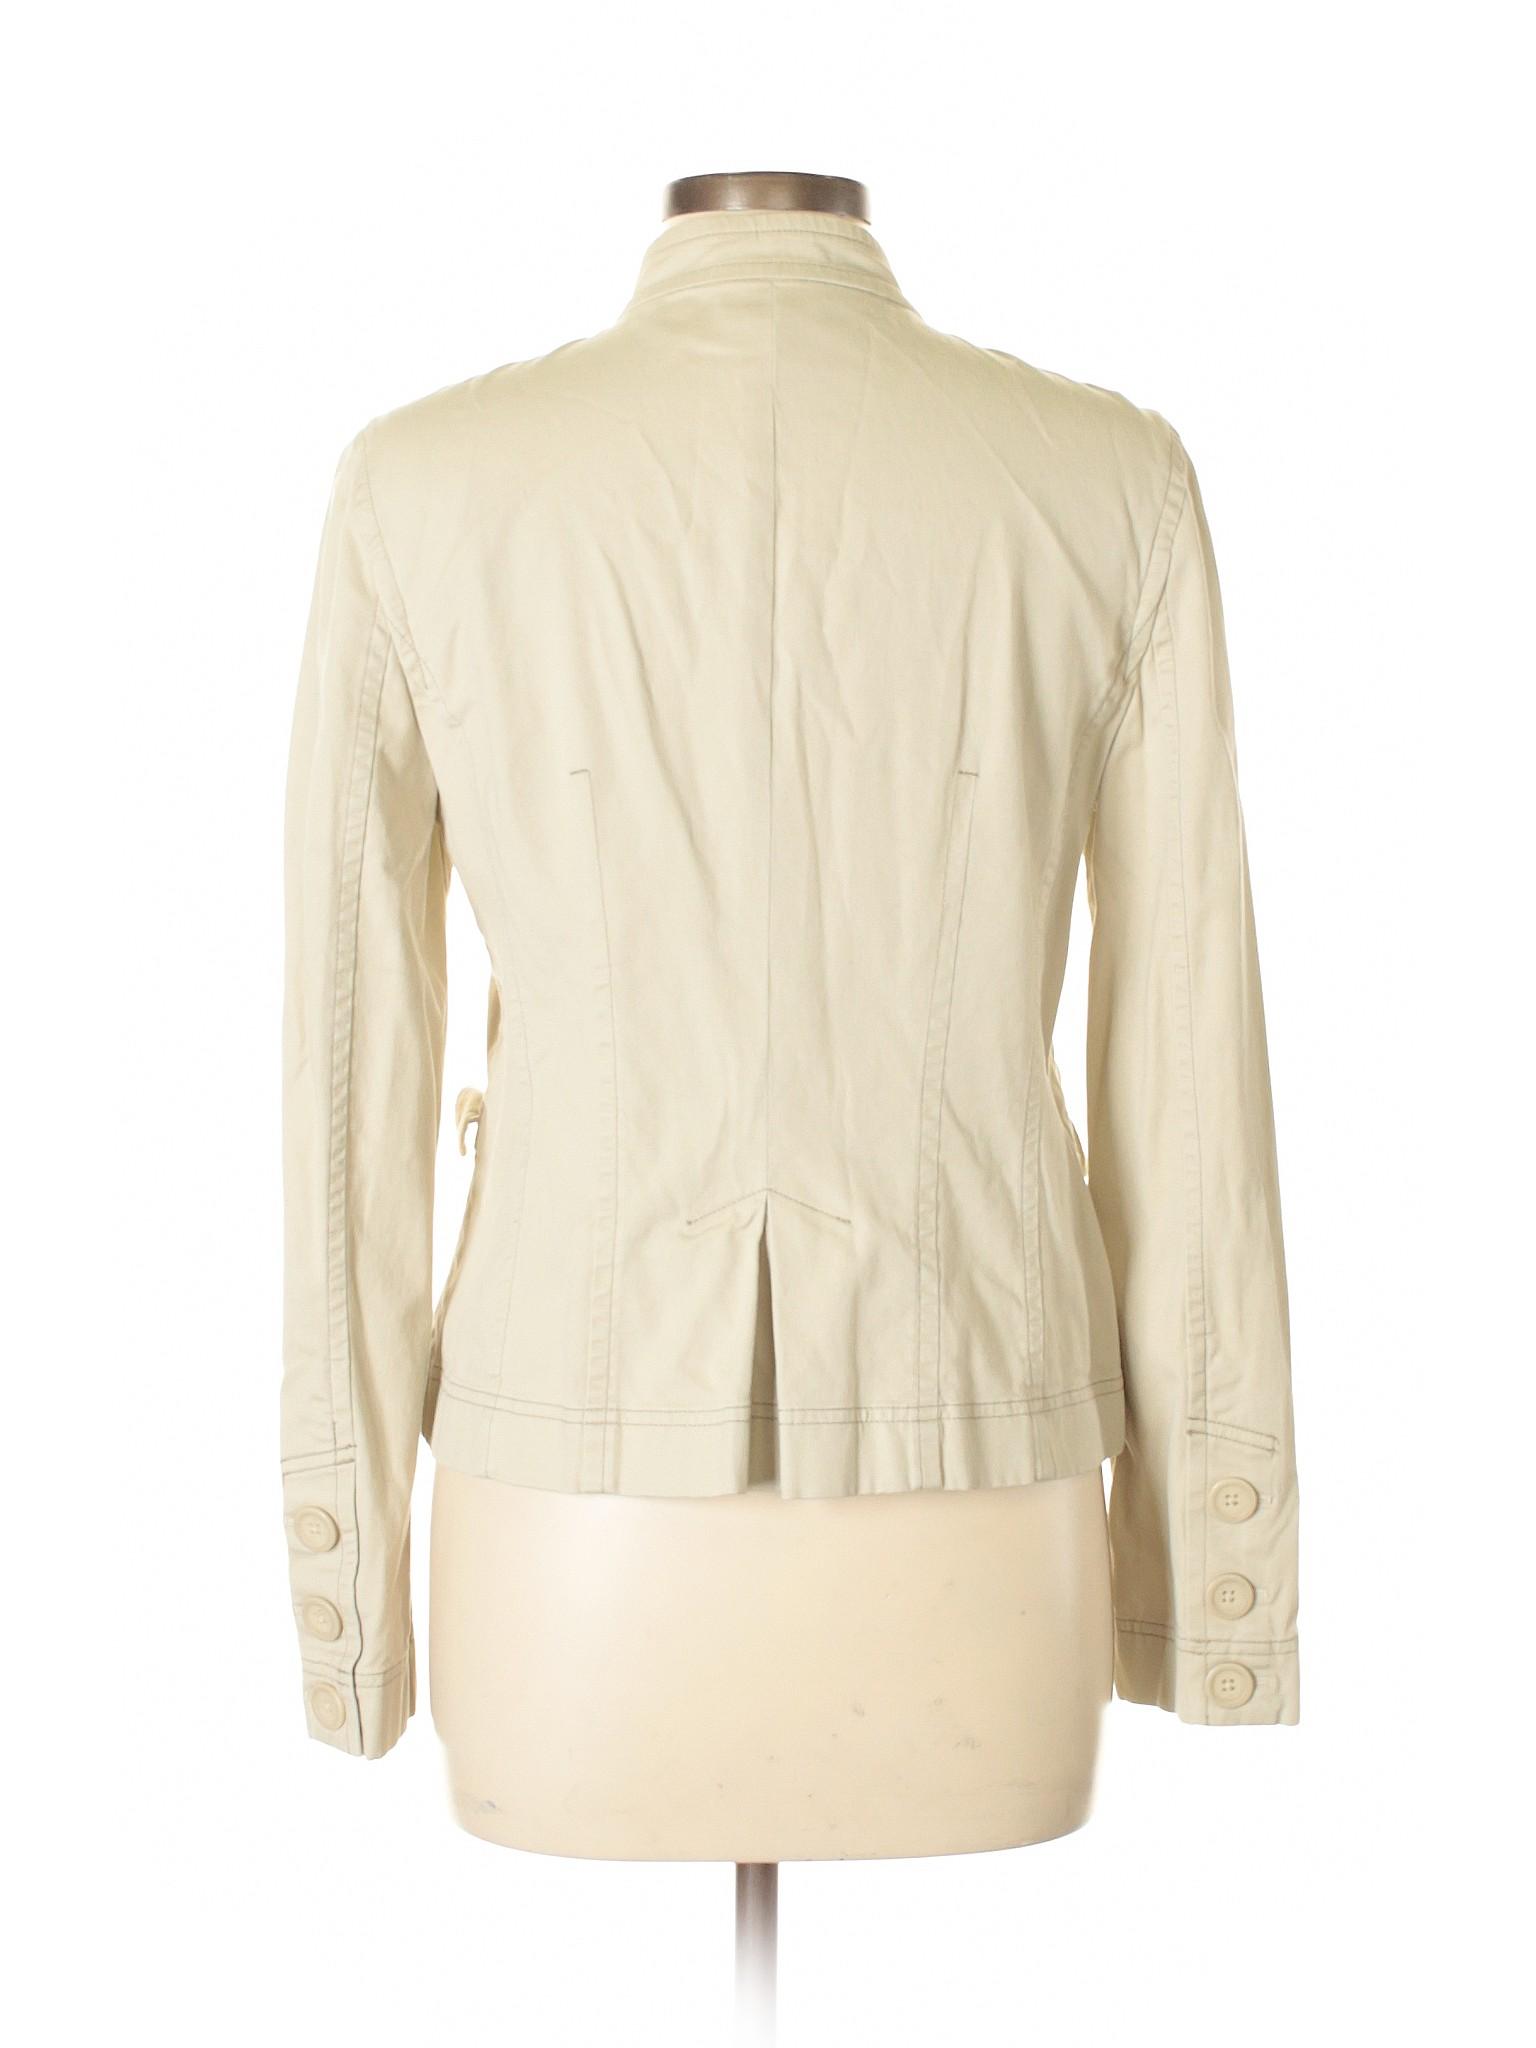 Ann Taylor leisure Boutique Jacket LOFT 75wqaaxSE